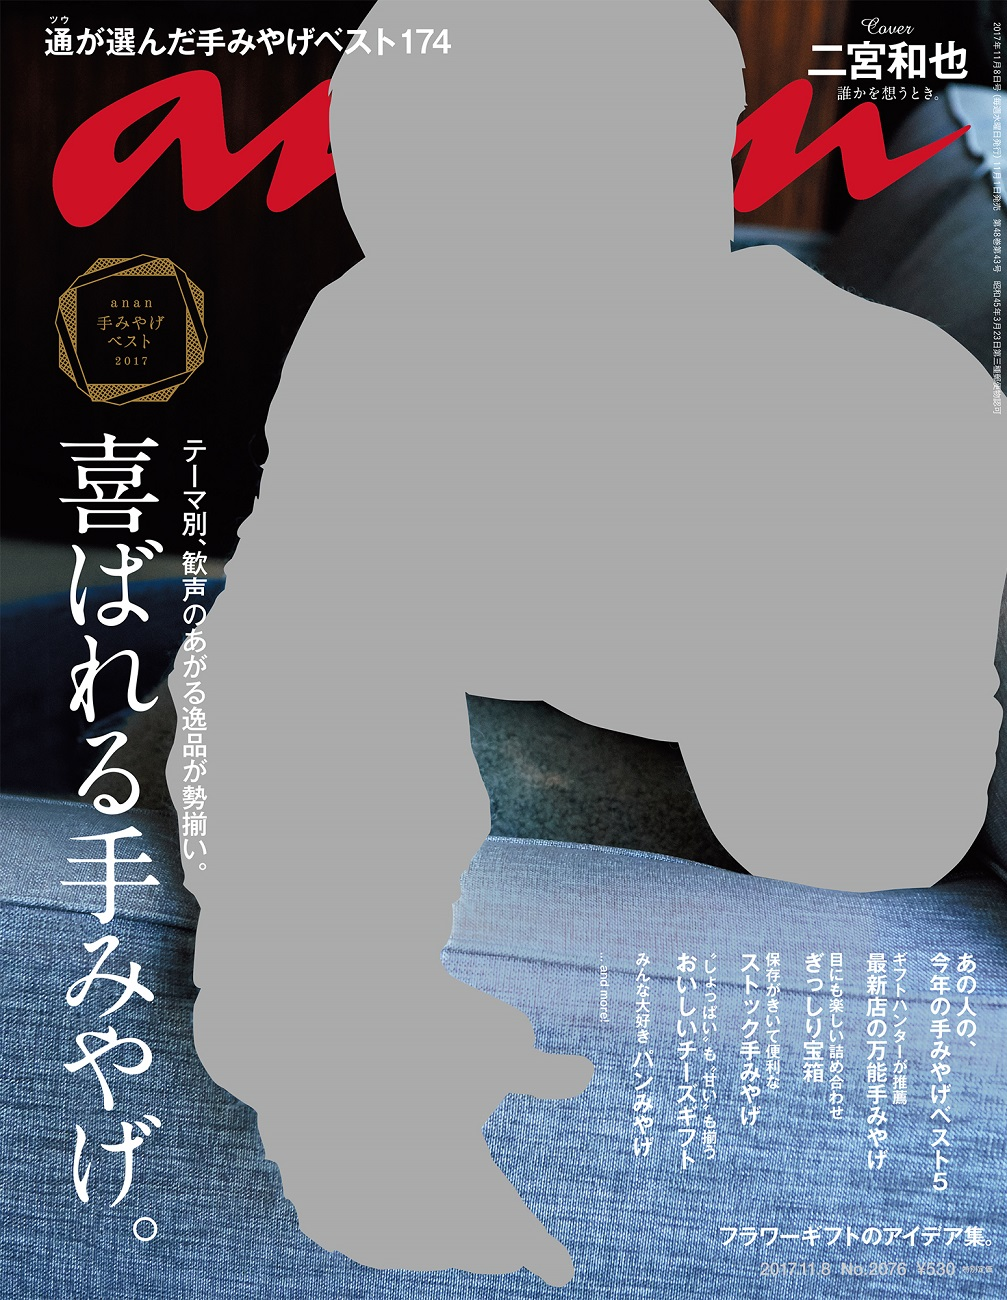 anan表紙に登場、二宮和也さんの撮影ストーリー!「喜ばれる手みやげ。」特集